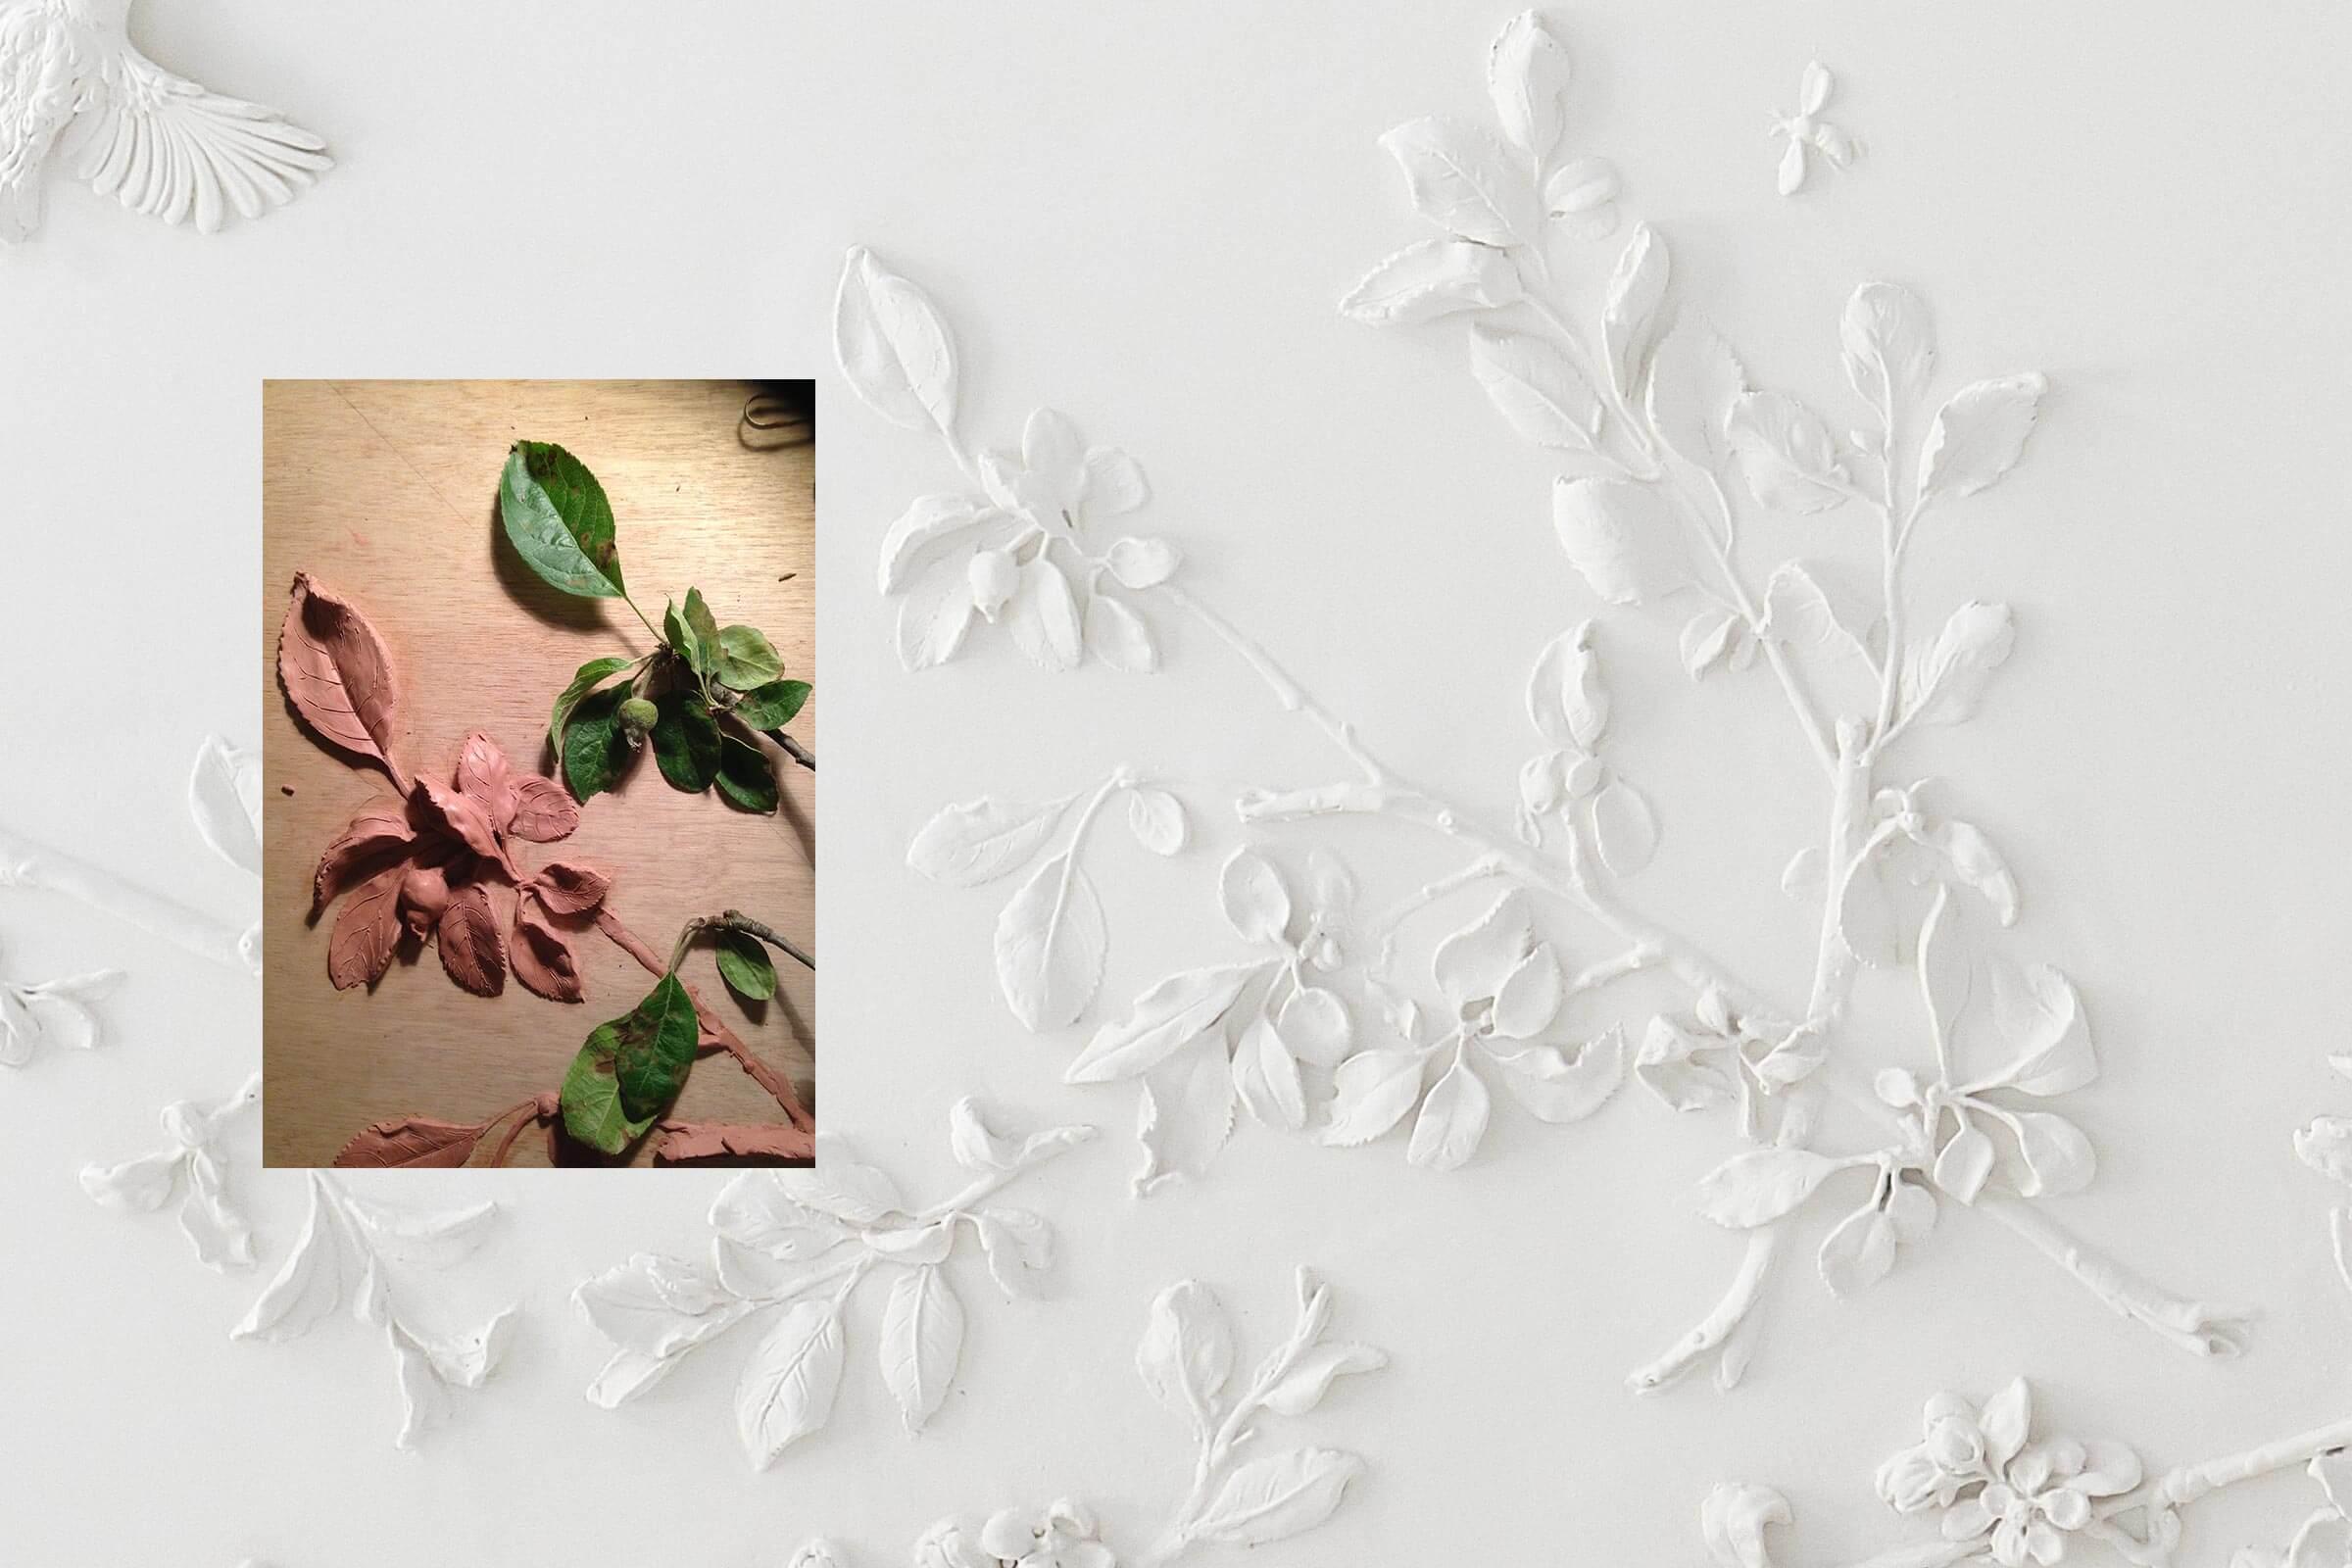 claus lind © modellering stukkatør stukloft roset stukkatur gips håndværk